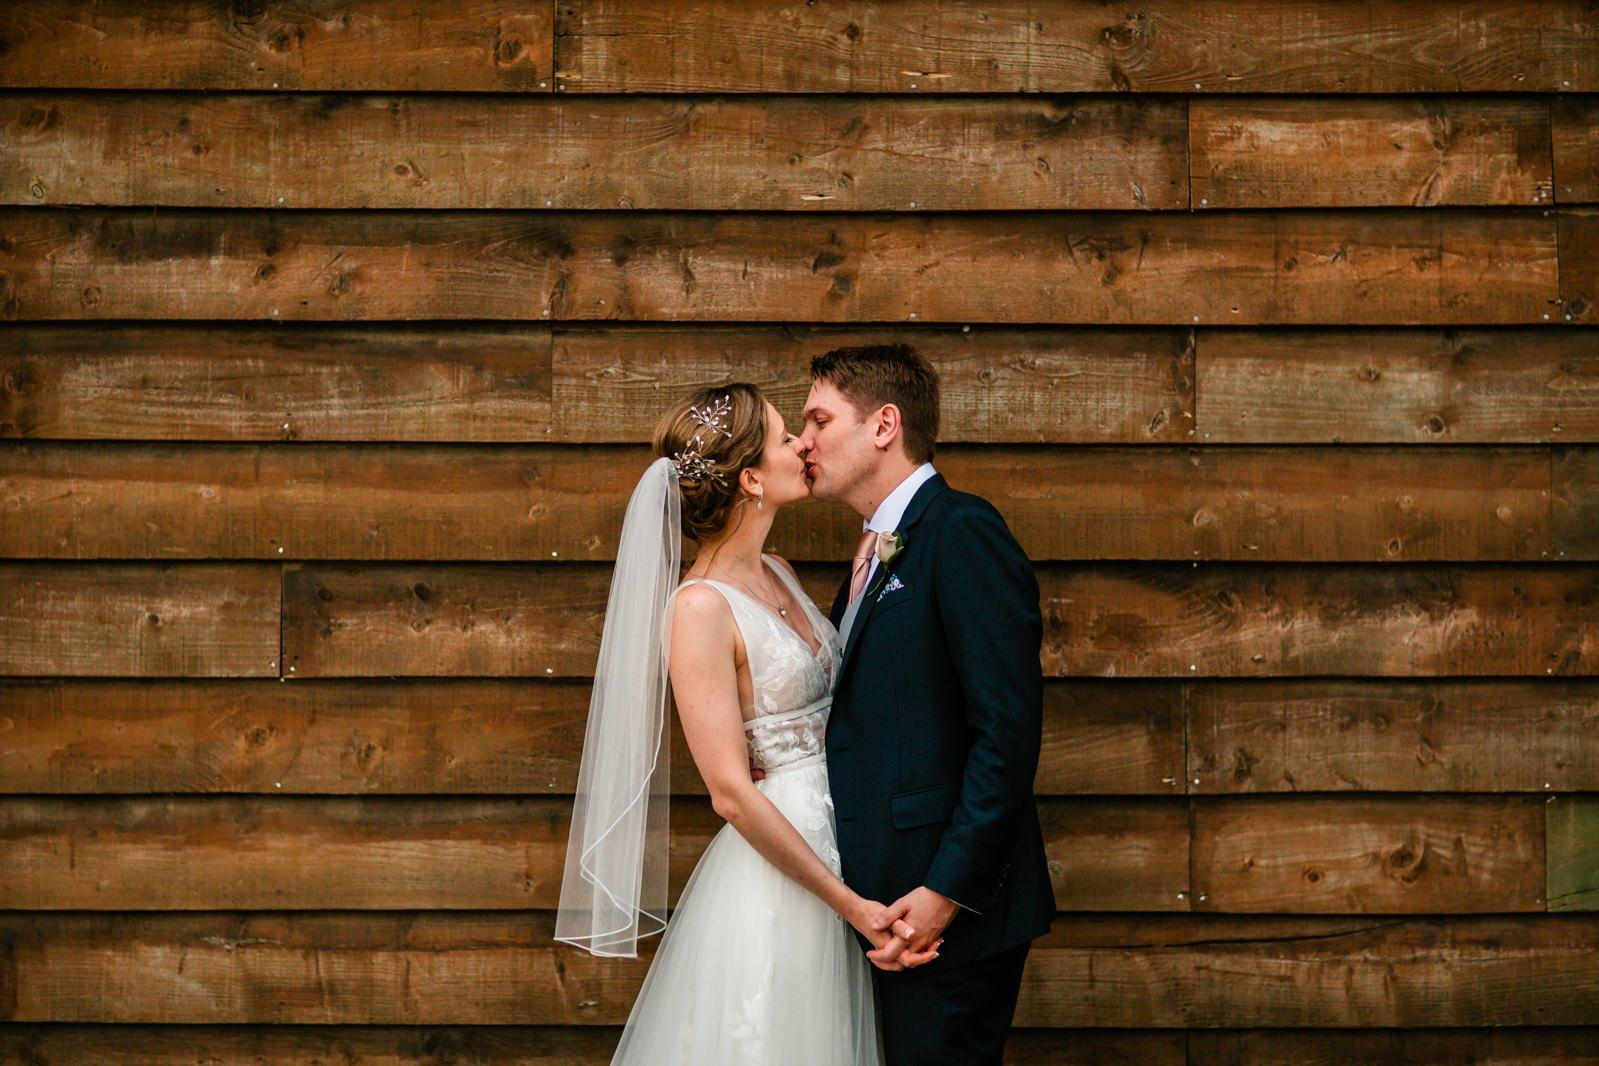 Beautiful Lillibrooke Manor Wedding - Ksenia & Iain 165